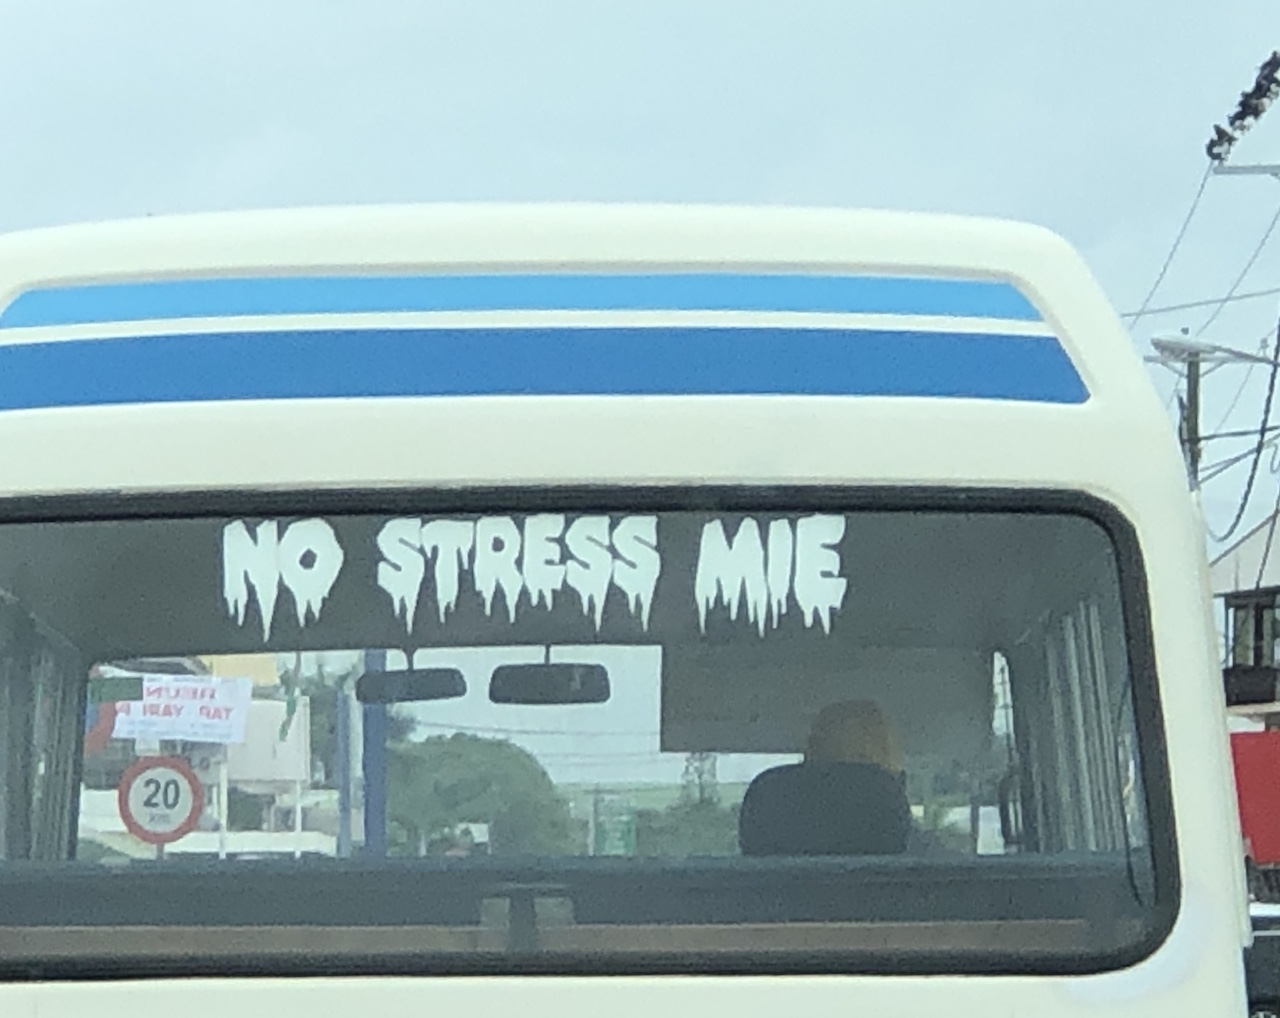 bus window humor.